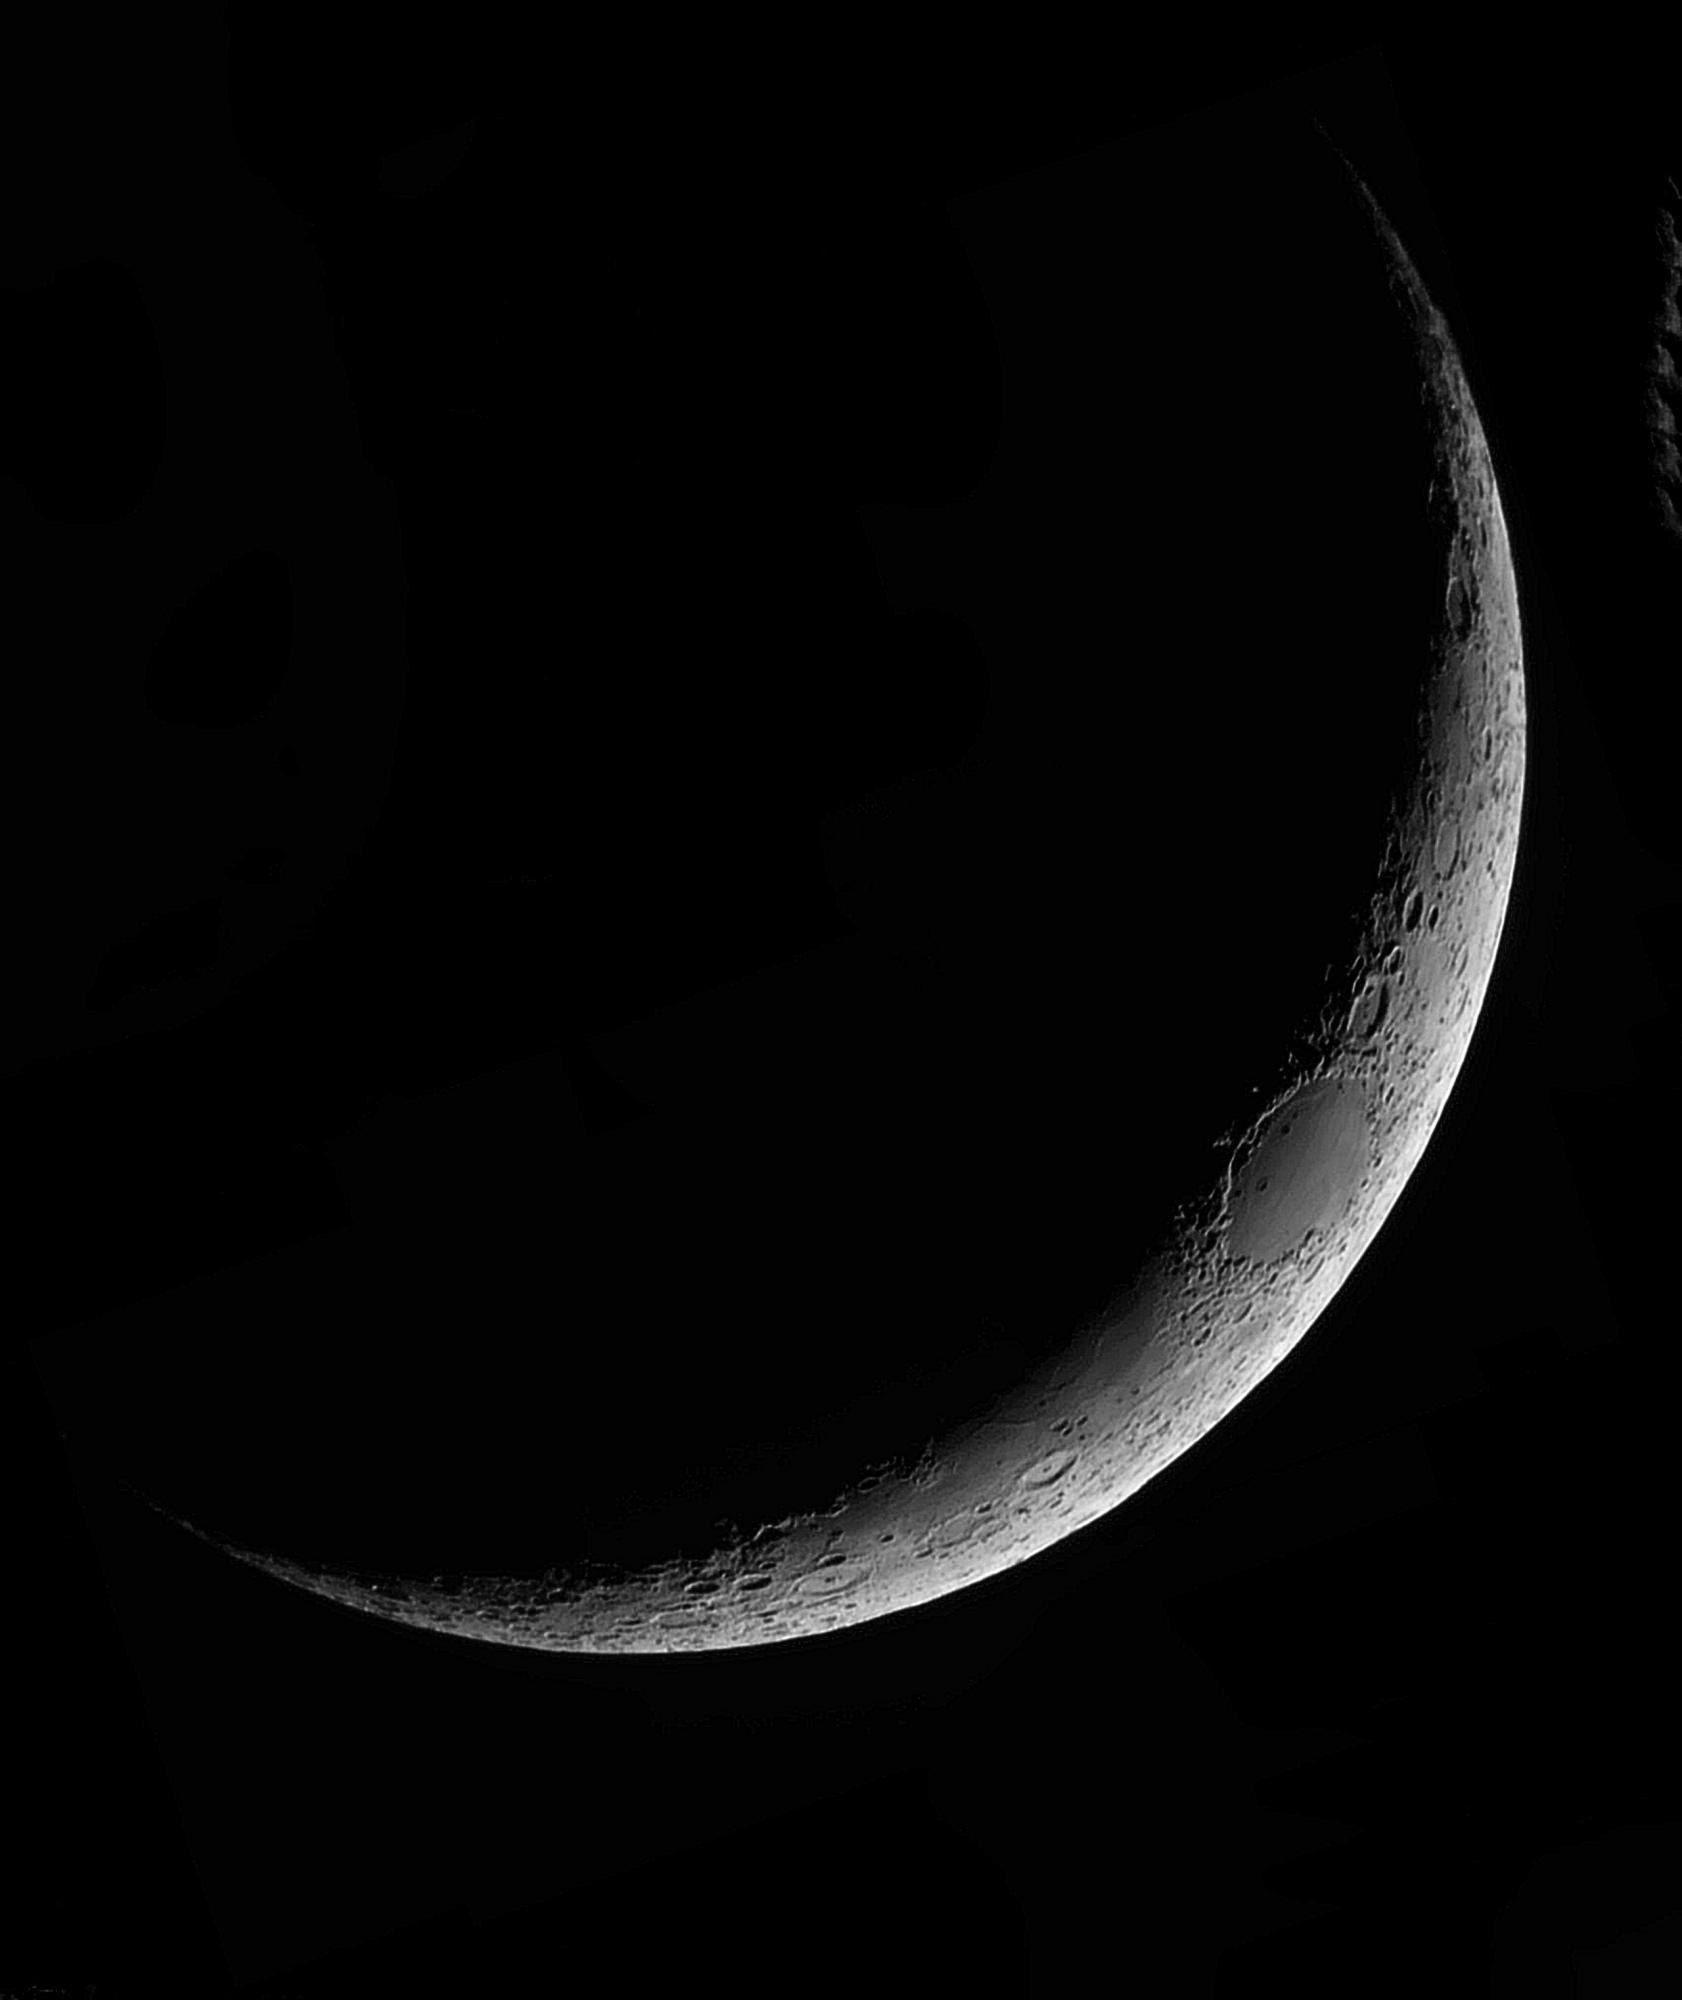 lune astrosurface.jpg